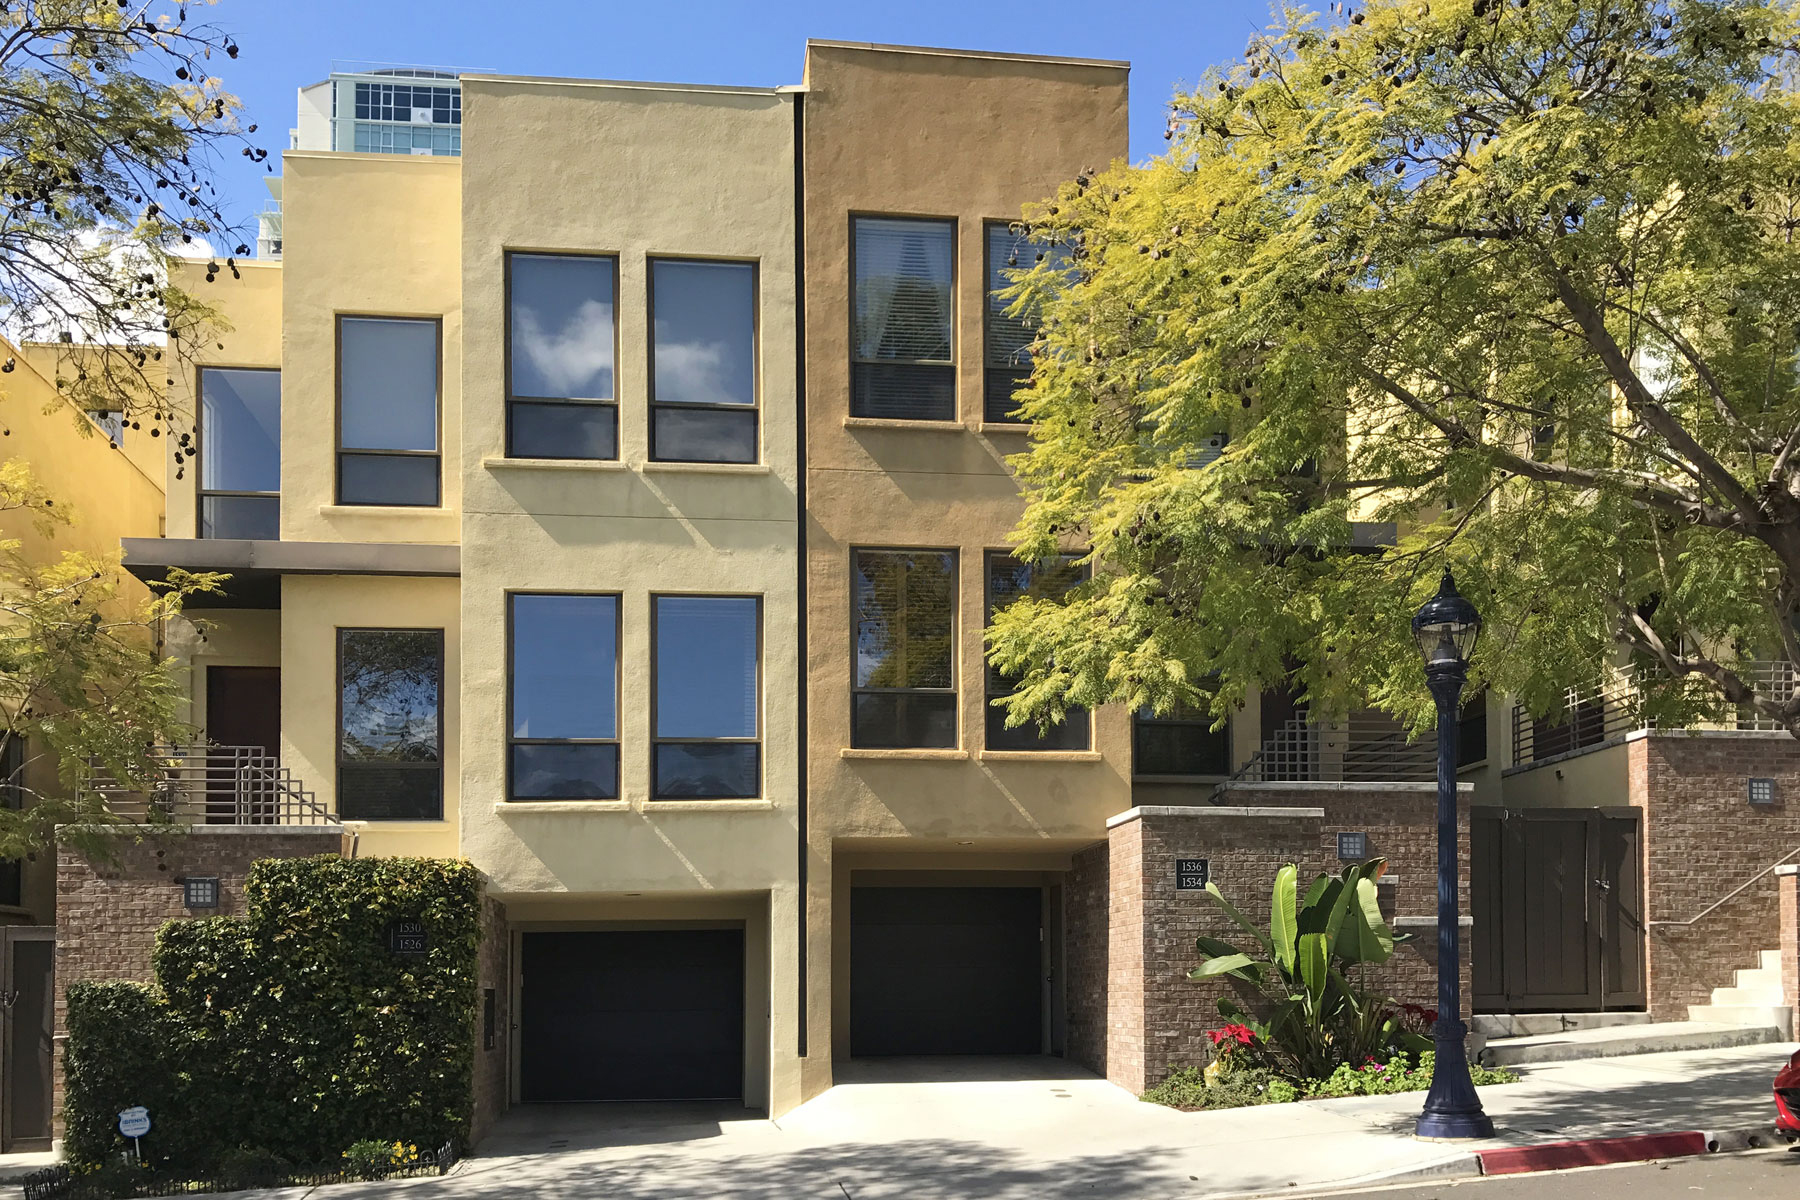 Condomínio para Venda às Citymark at Cortez Hill 1534 10th Avenue San Diego, Califórnia, 92101 Estados Unidos